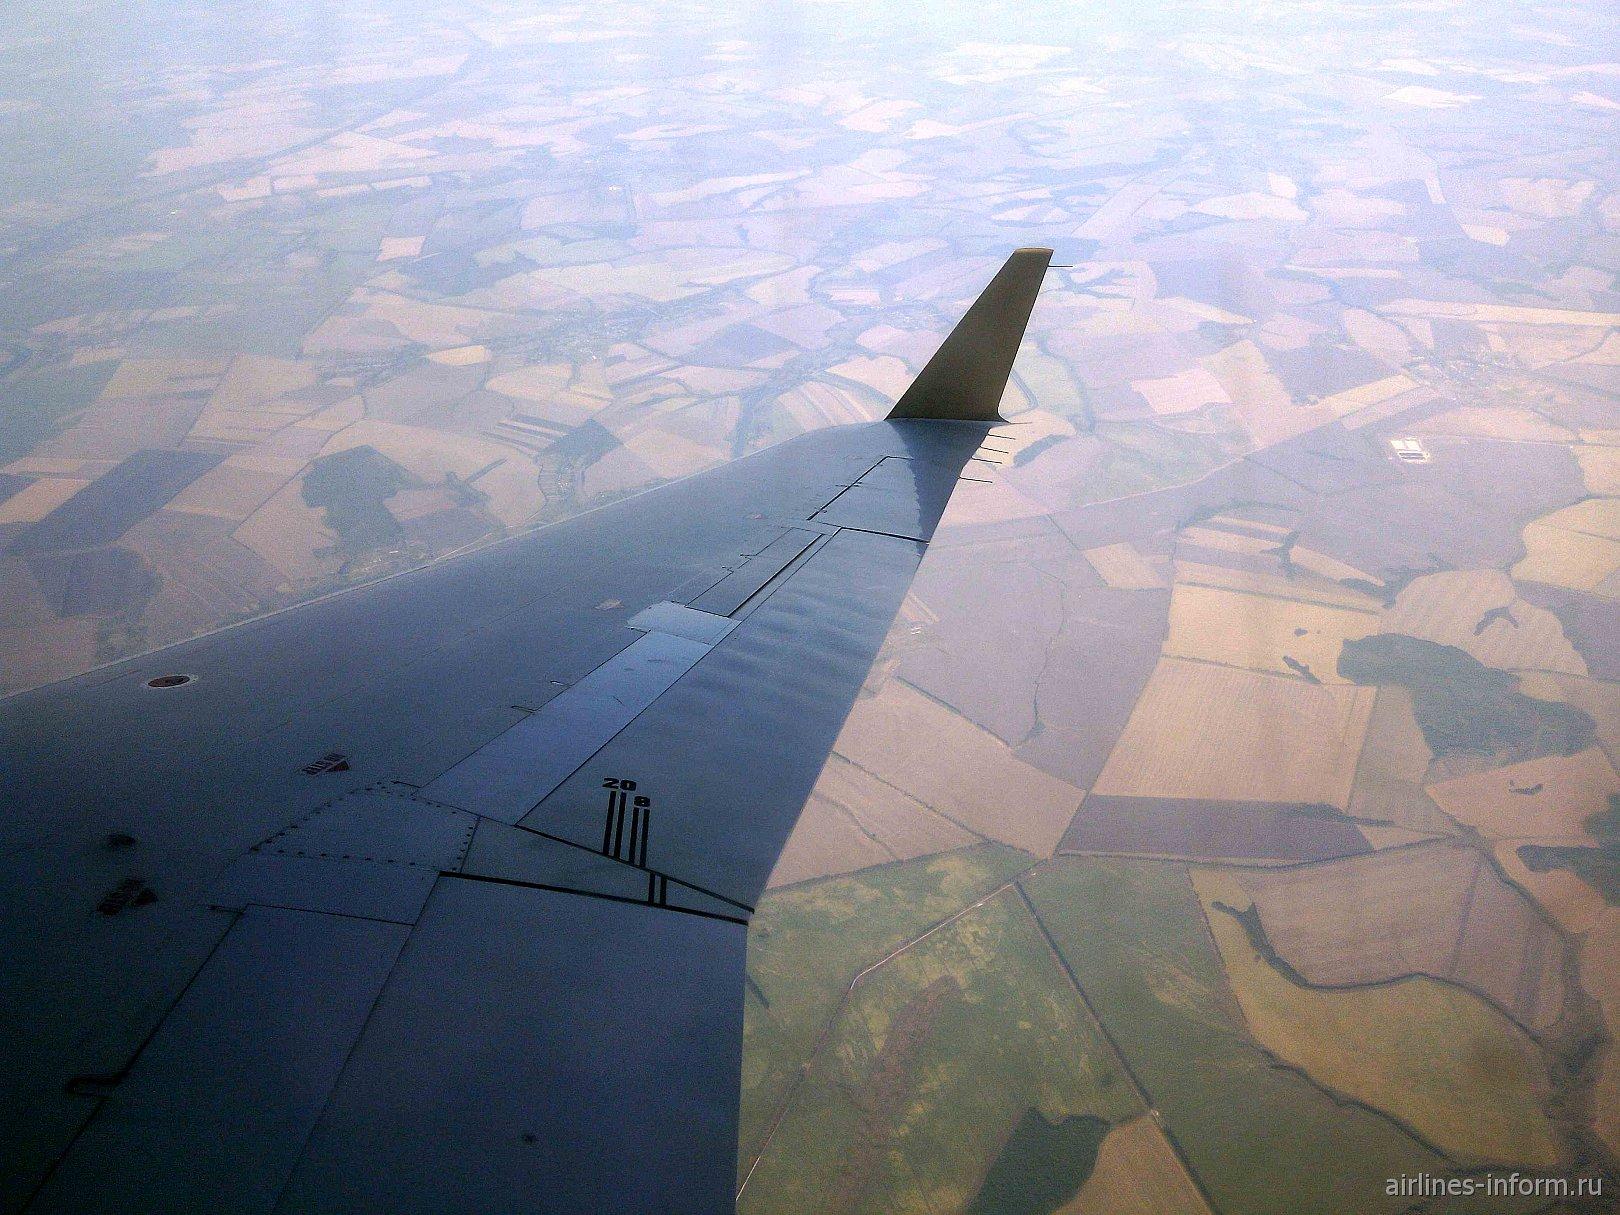 [VOZ - VKO] Возвращение в Москву из жаркого Воронежа на Bombardier CRJ200 а\к Руслайн